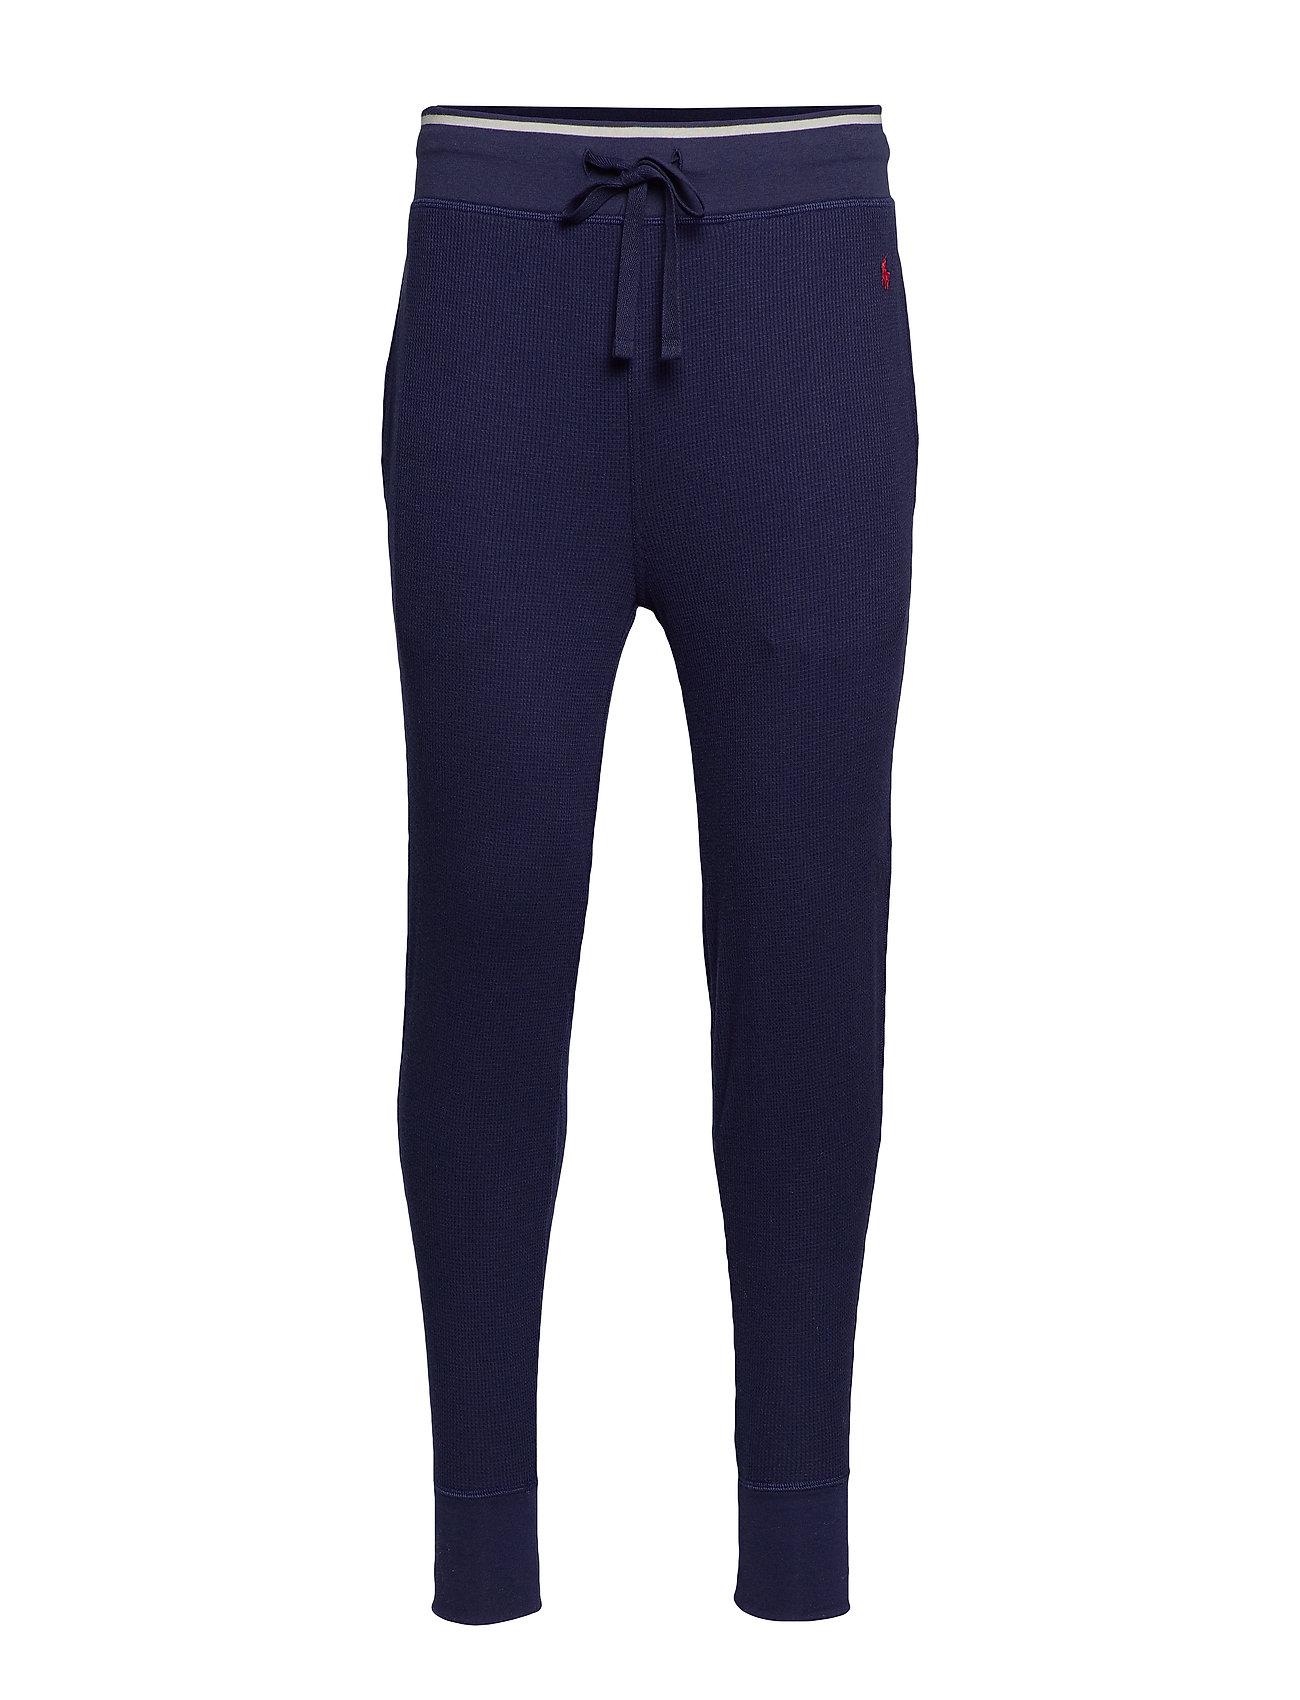 Polo Ralph Lauren Underwear Waffle-Knit Jogger - CRUISE NAVY/RL 20